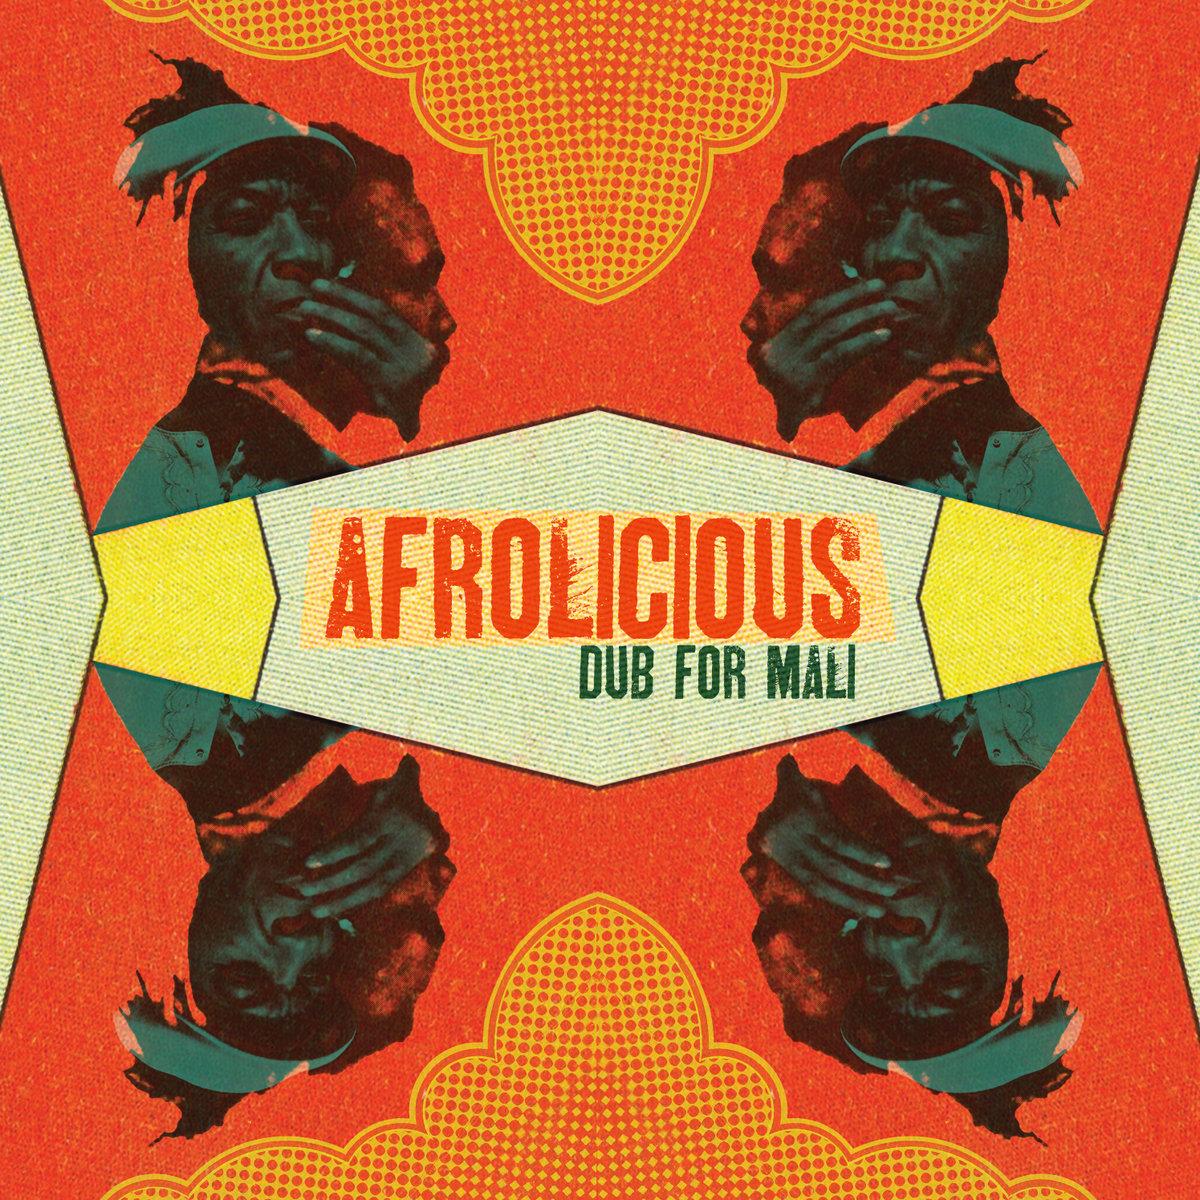 A Dub for Mali - Single (2011)